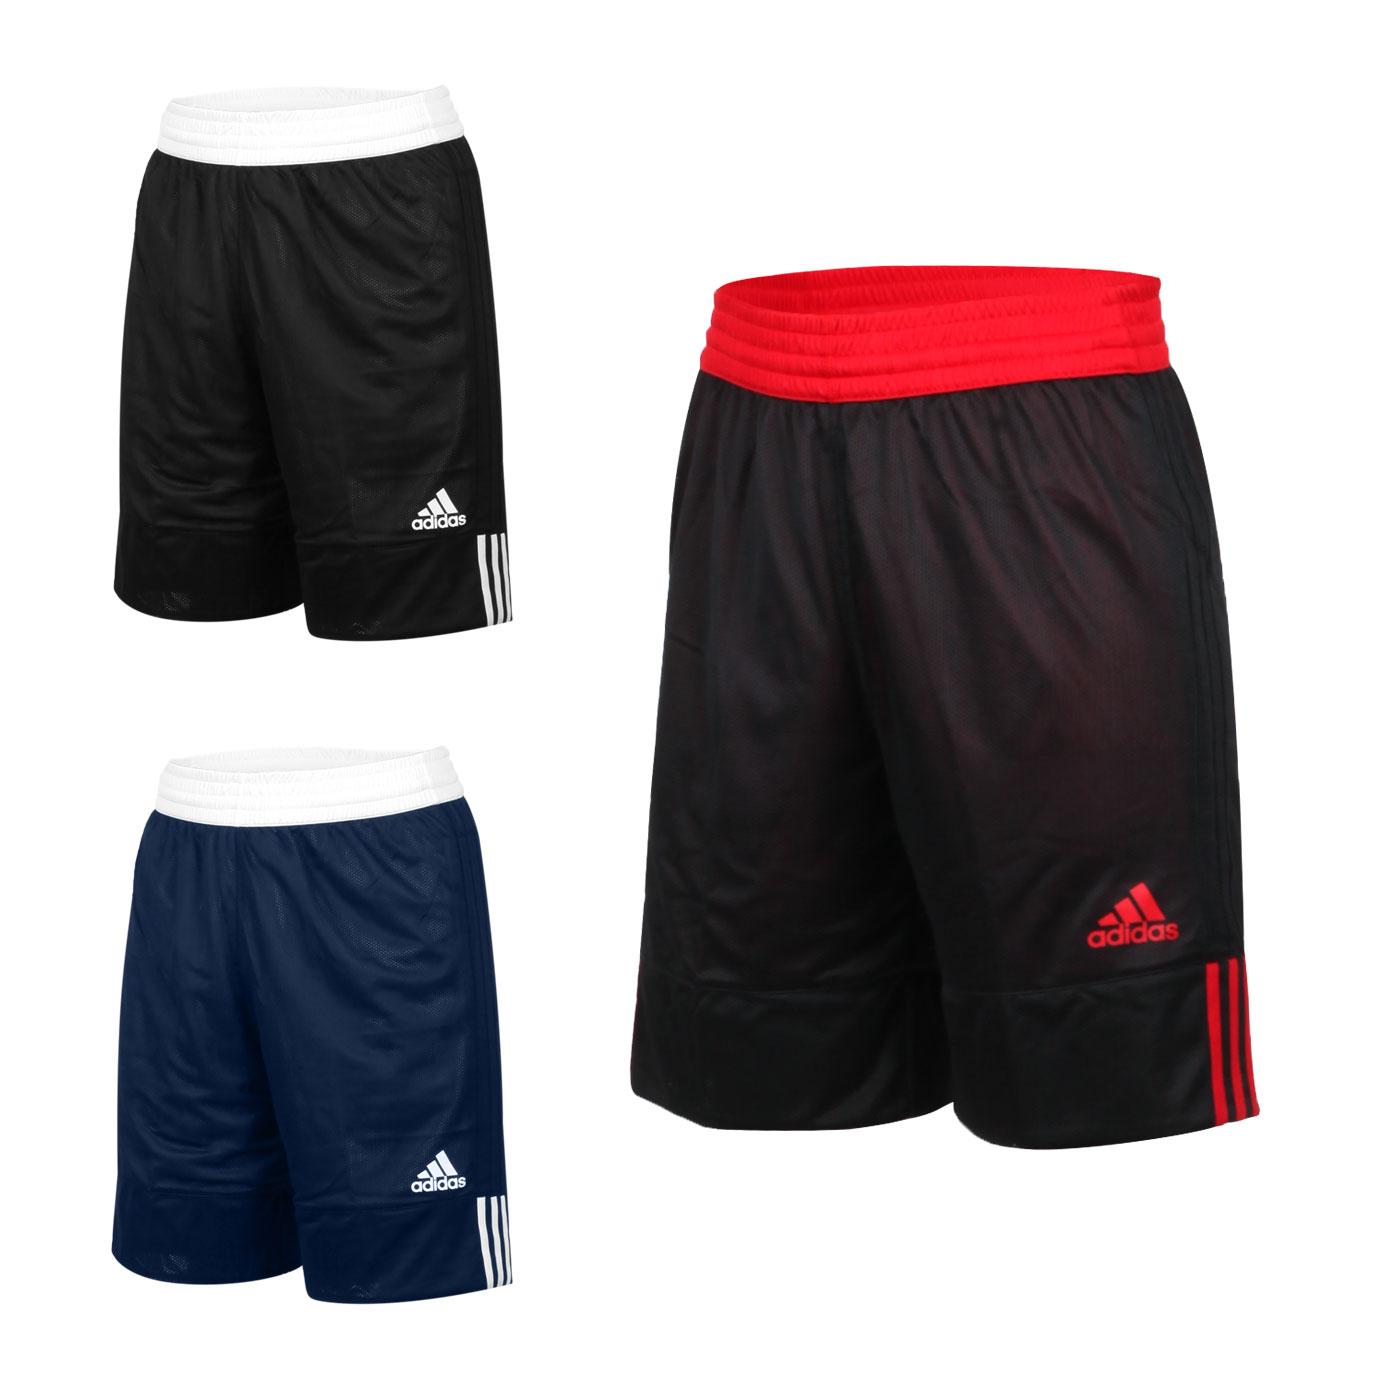 ADIDAS 男款雙面籃球短褲 DX6386